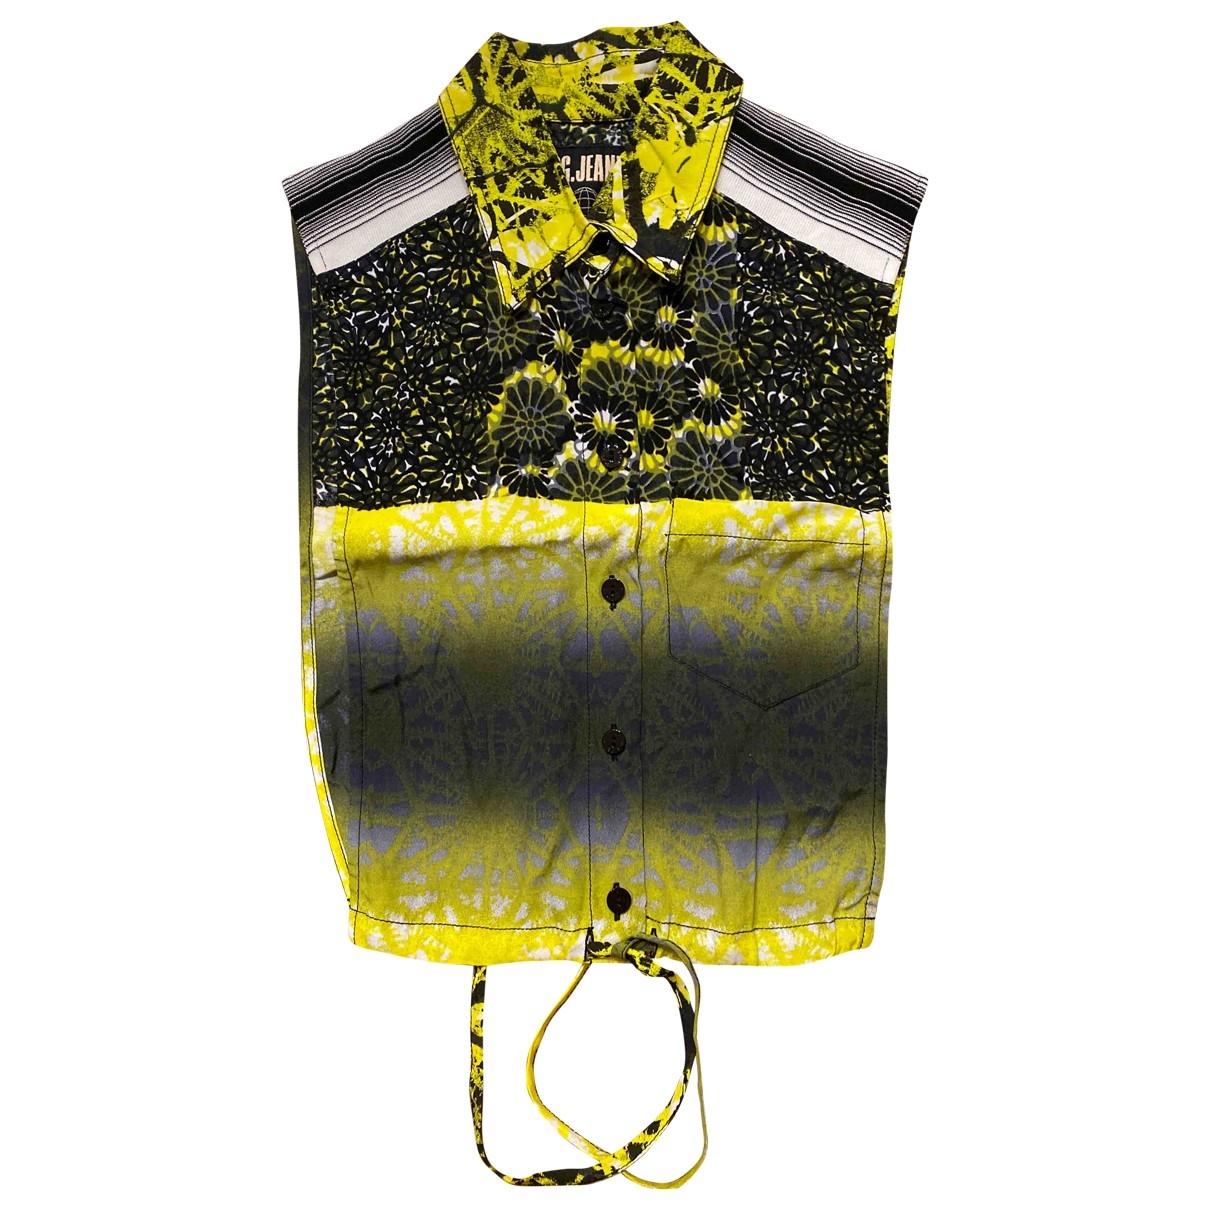 Camiseta sin mangas Jean Paul Gaultier